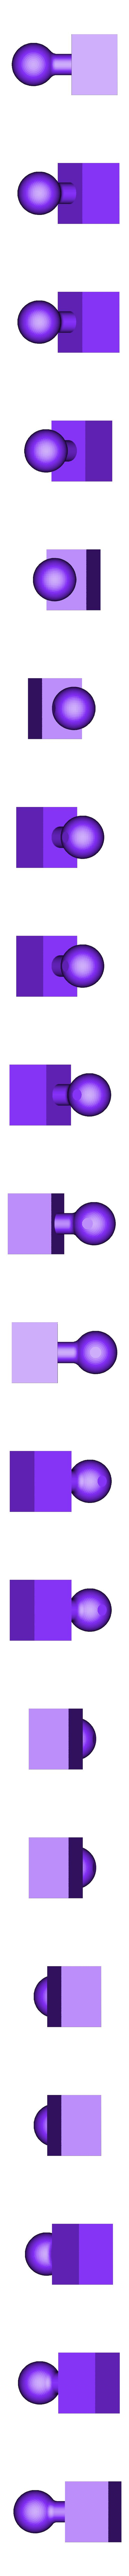 test_piece_ball.stl Download free STL file Joystick PS4 • 3D print object, Osichan